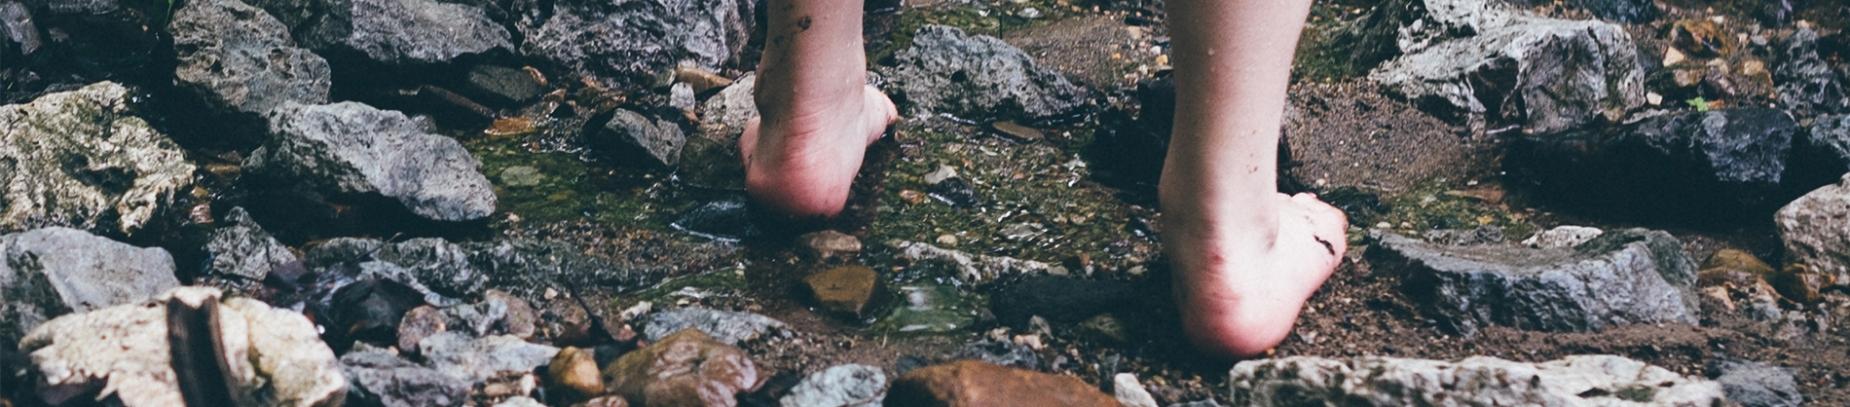 A person bare foot walking through a stream